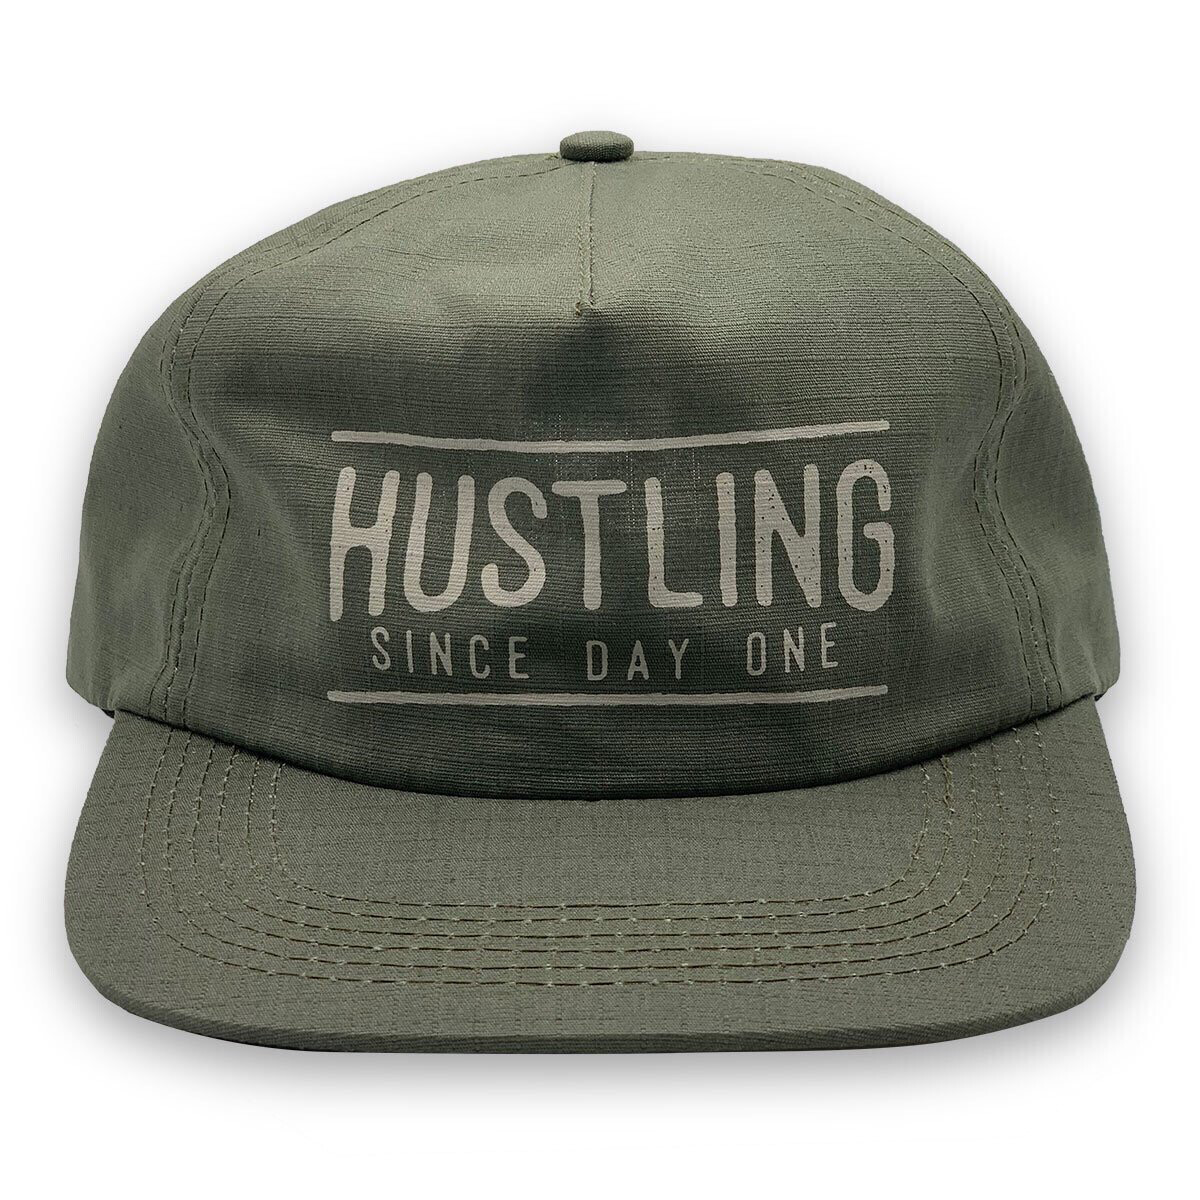 Original cred Hustling Cap